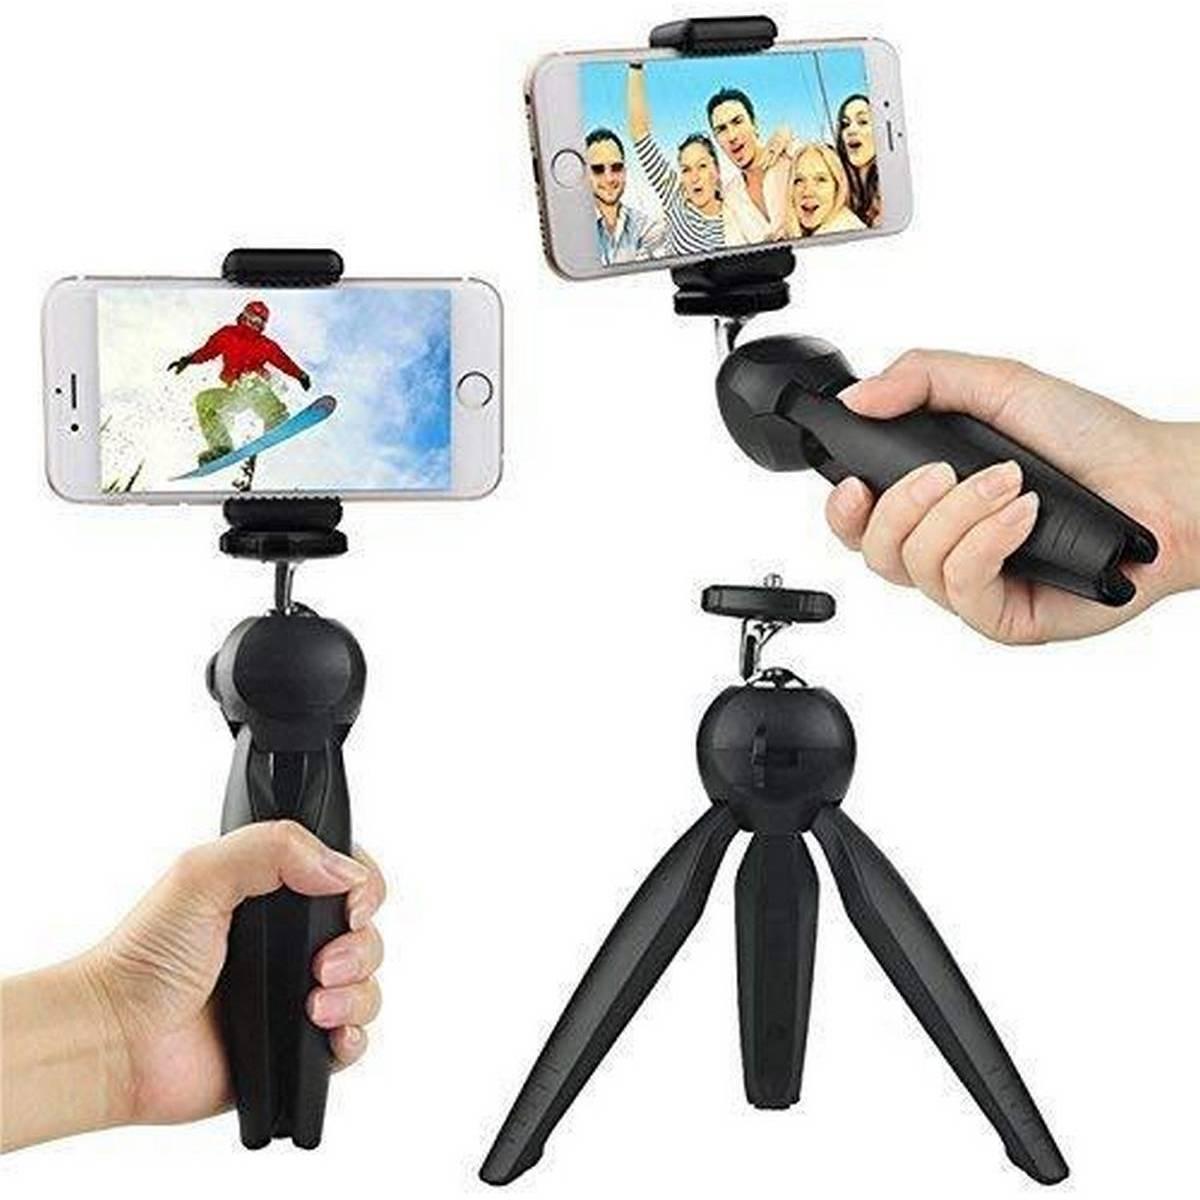 Mini Tripod - Yunteng Mini Tripod Stand For All Mobile Phones & Digital Cameras - Black